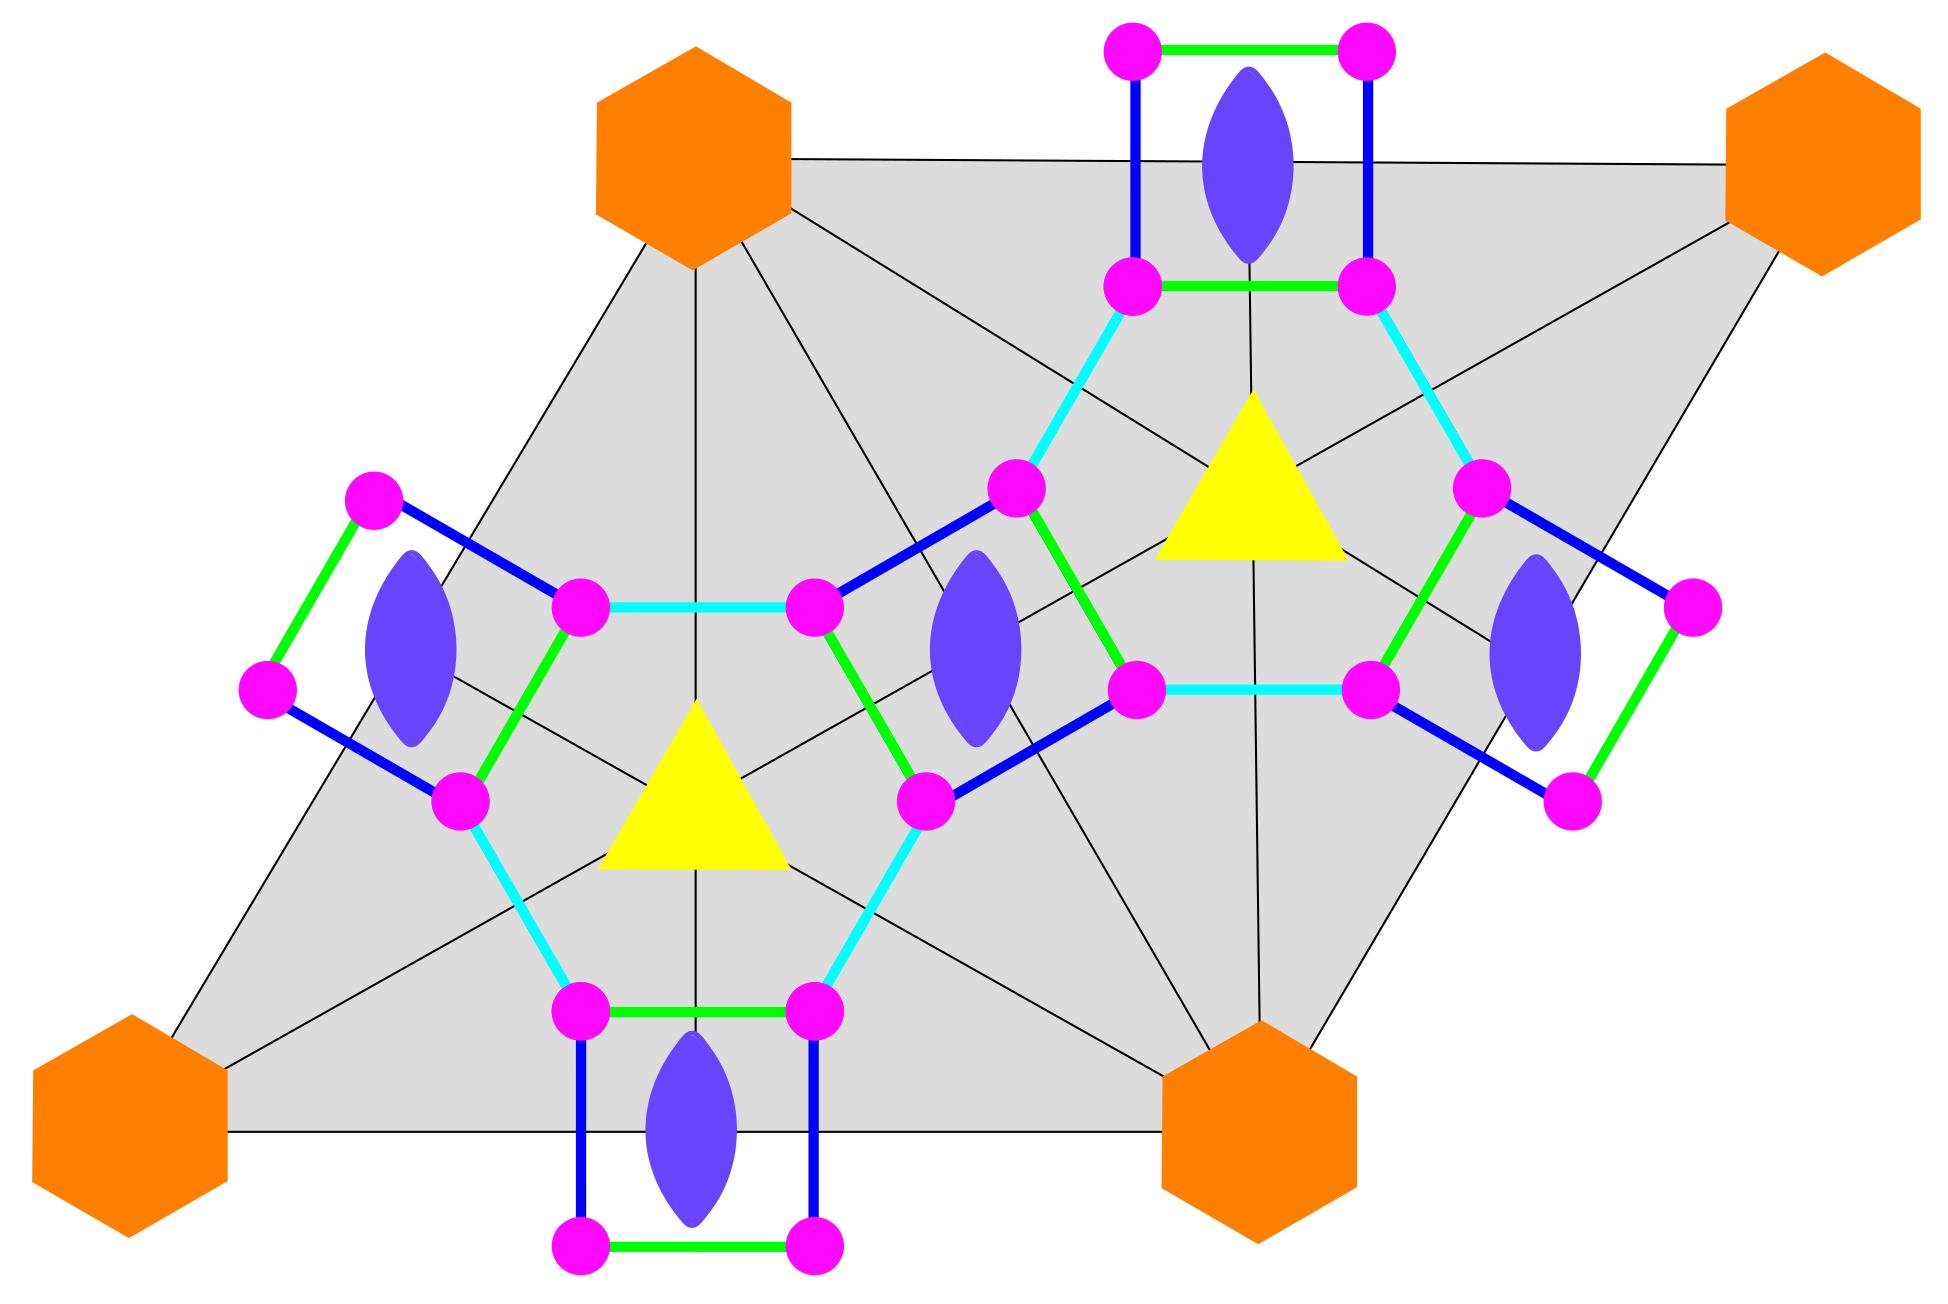 B clipart symmetrical figure. Symmetry free full text